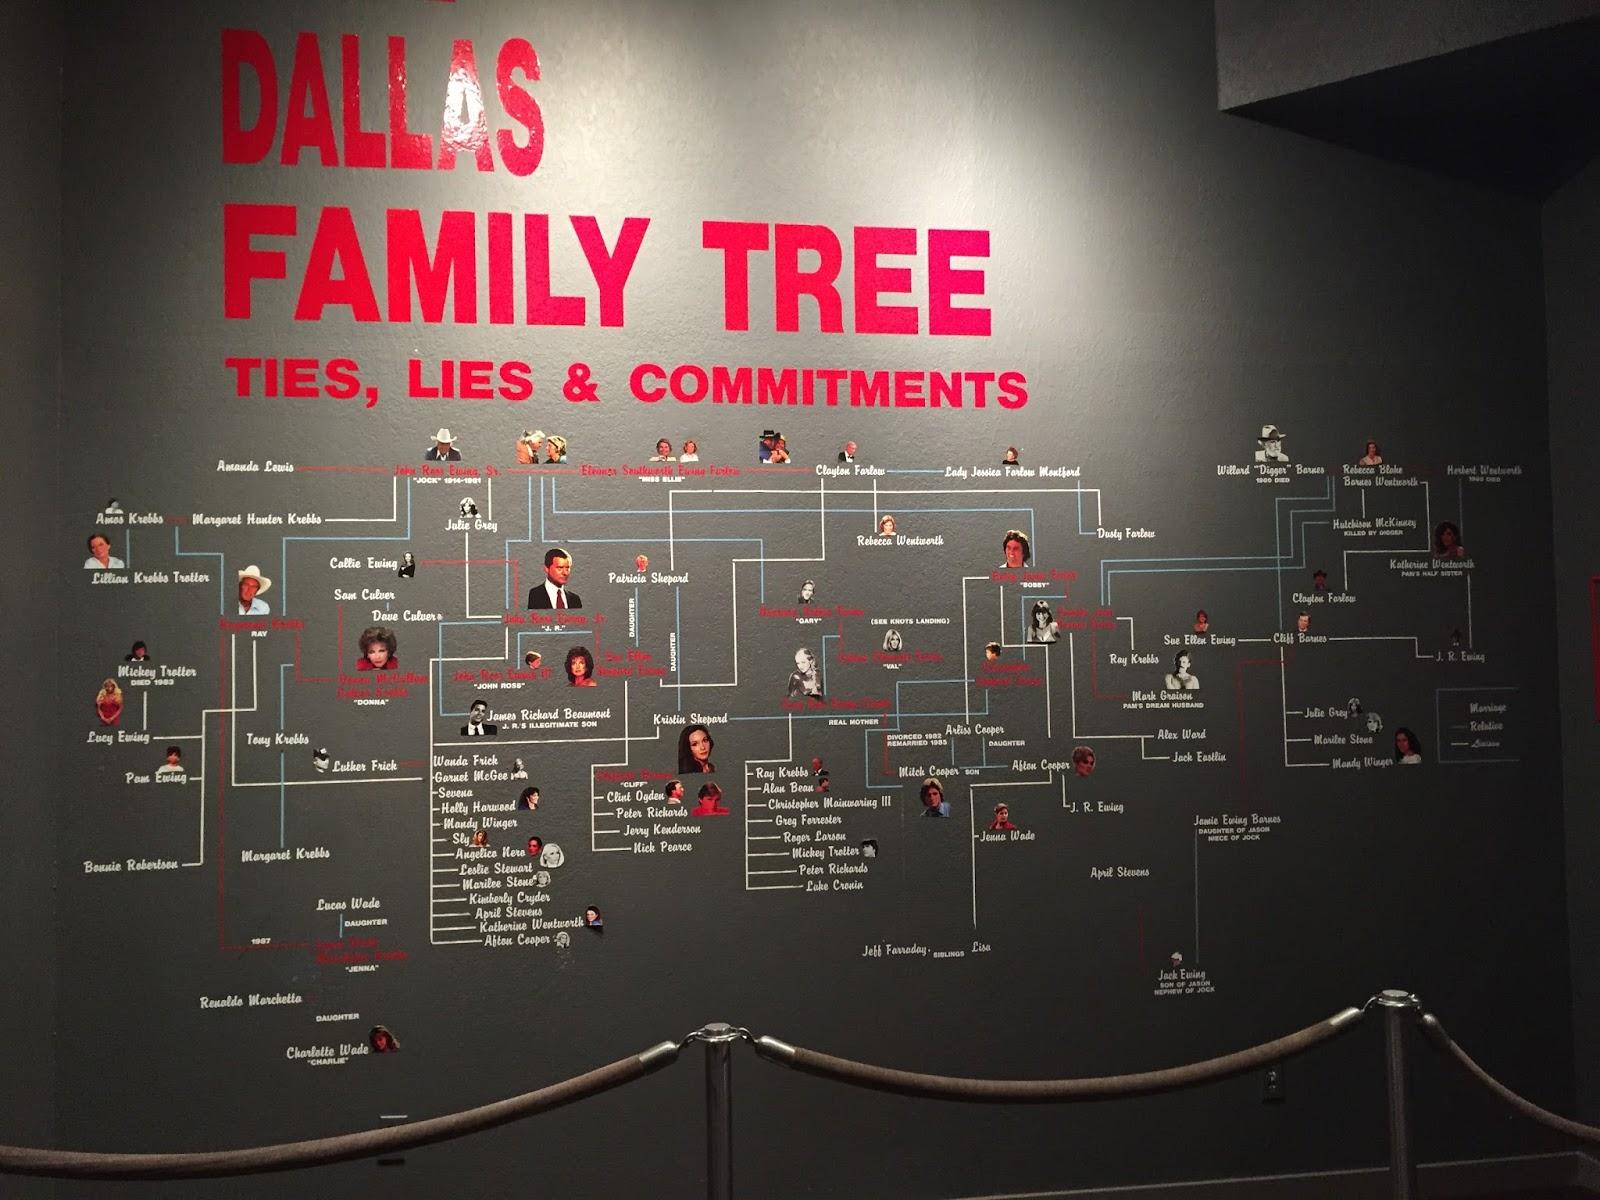 Isn 39 t she dovely southfork ranch - Dallas tv show family tree ...